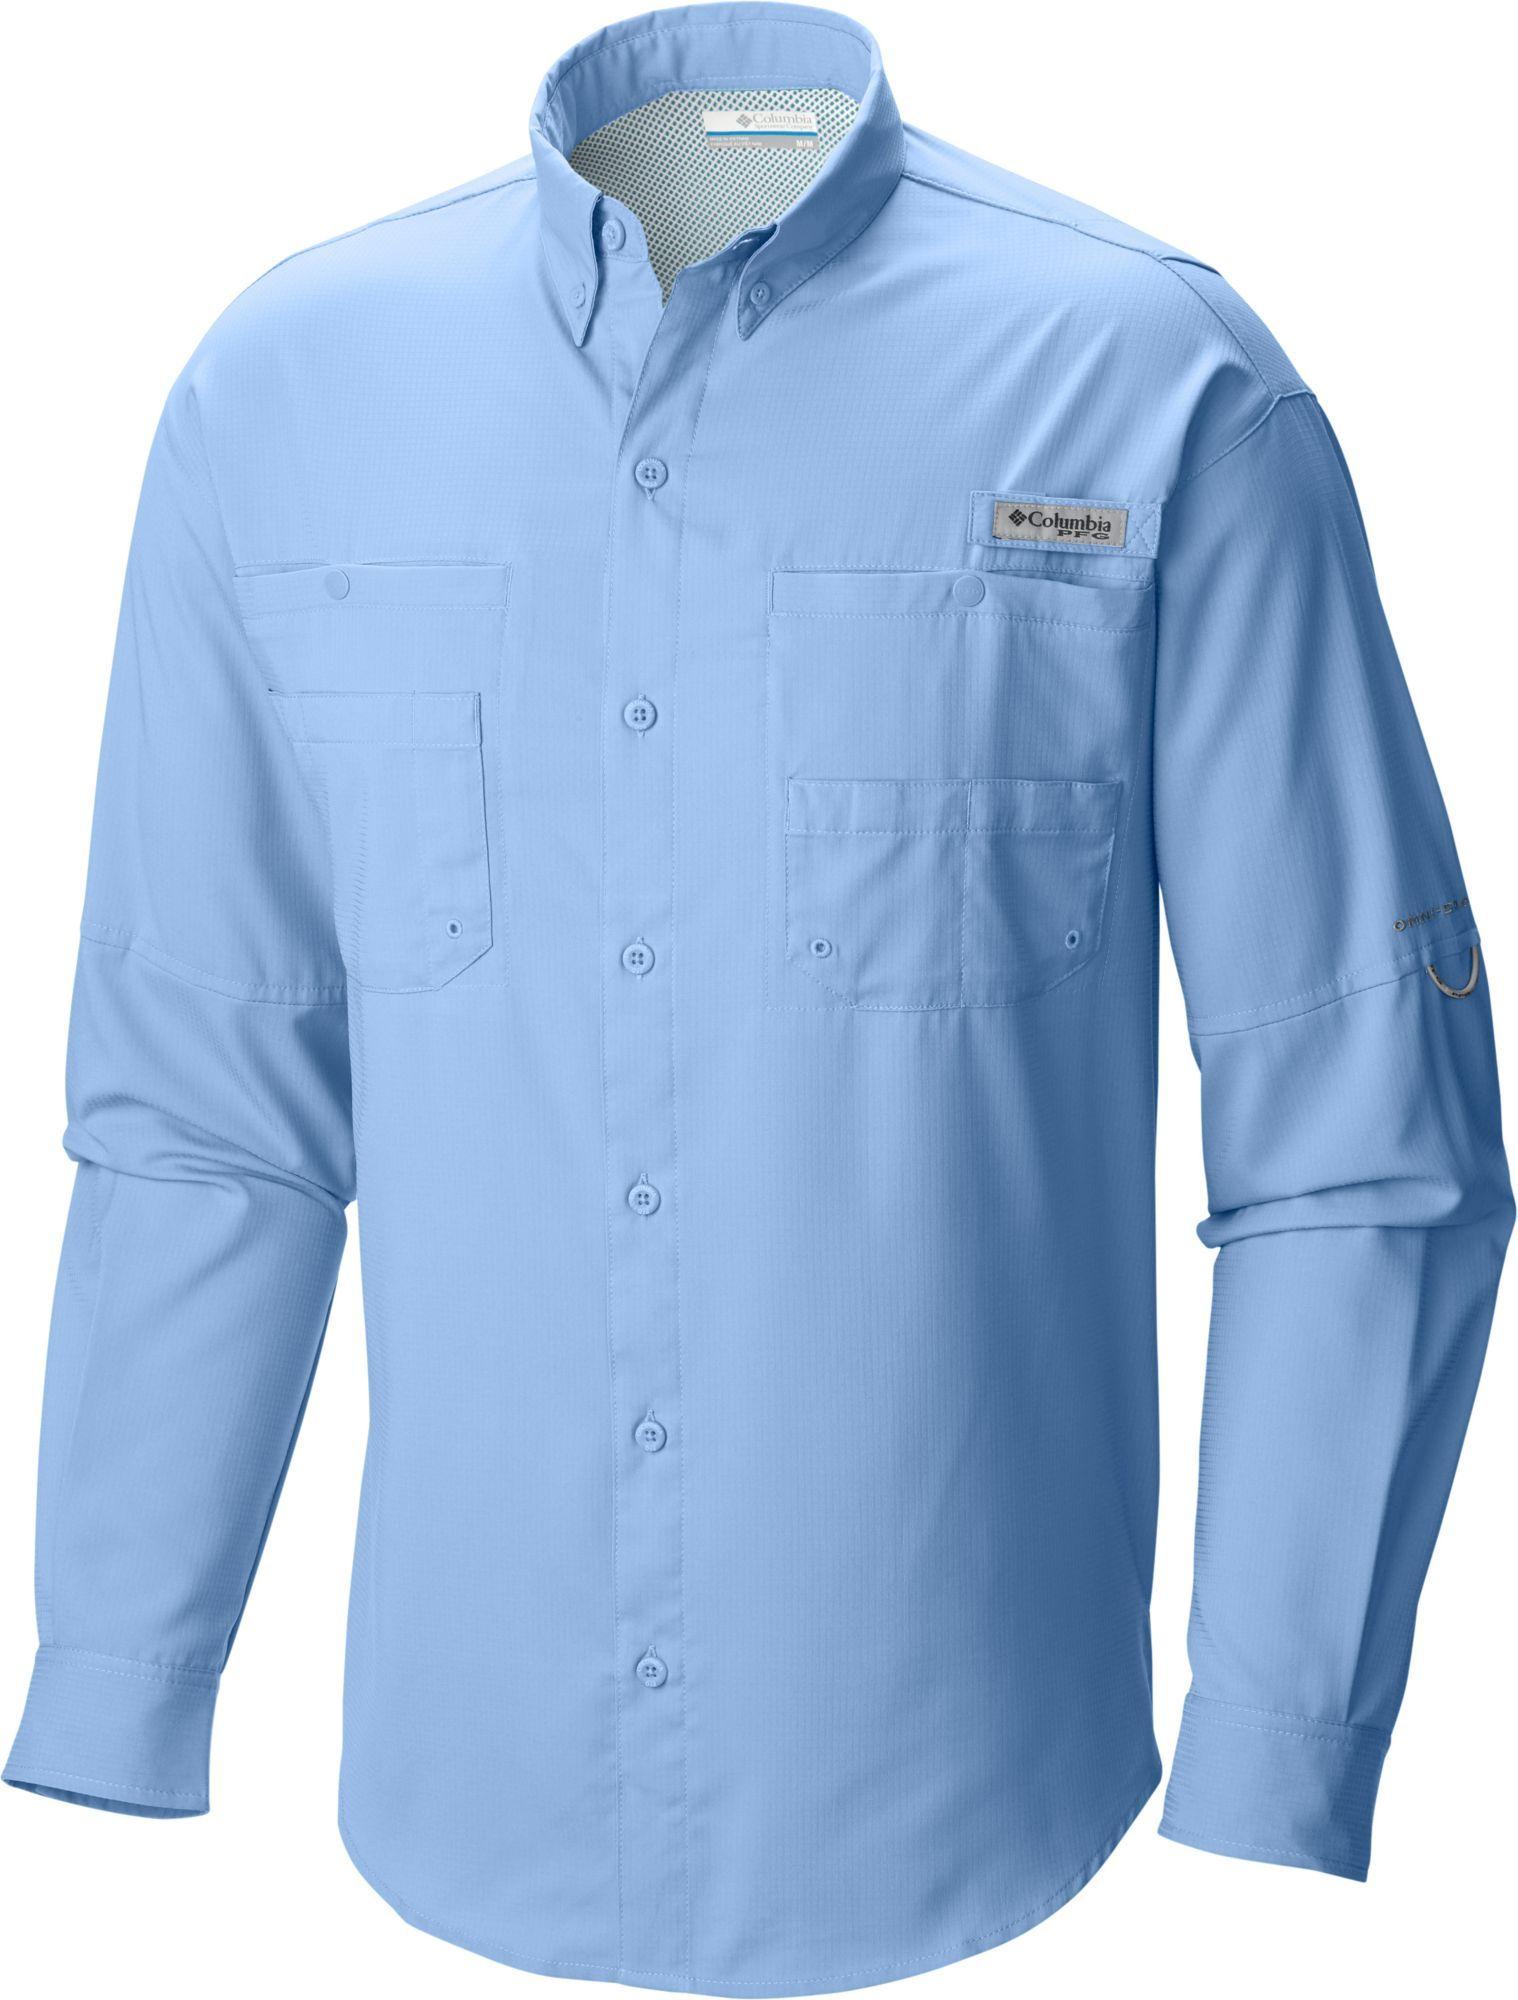 293f74d2340 Columbia Men's PFG Tamiami II Long Sleeve Shirt | Products | Long ...